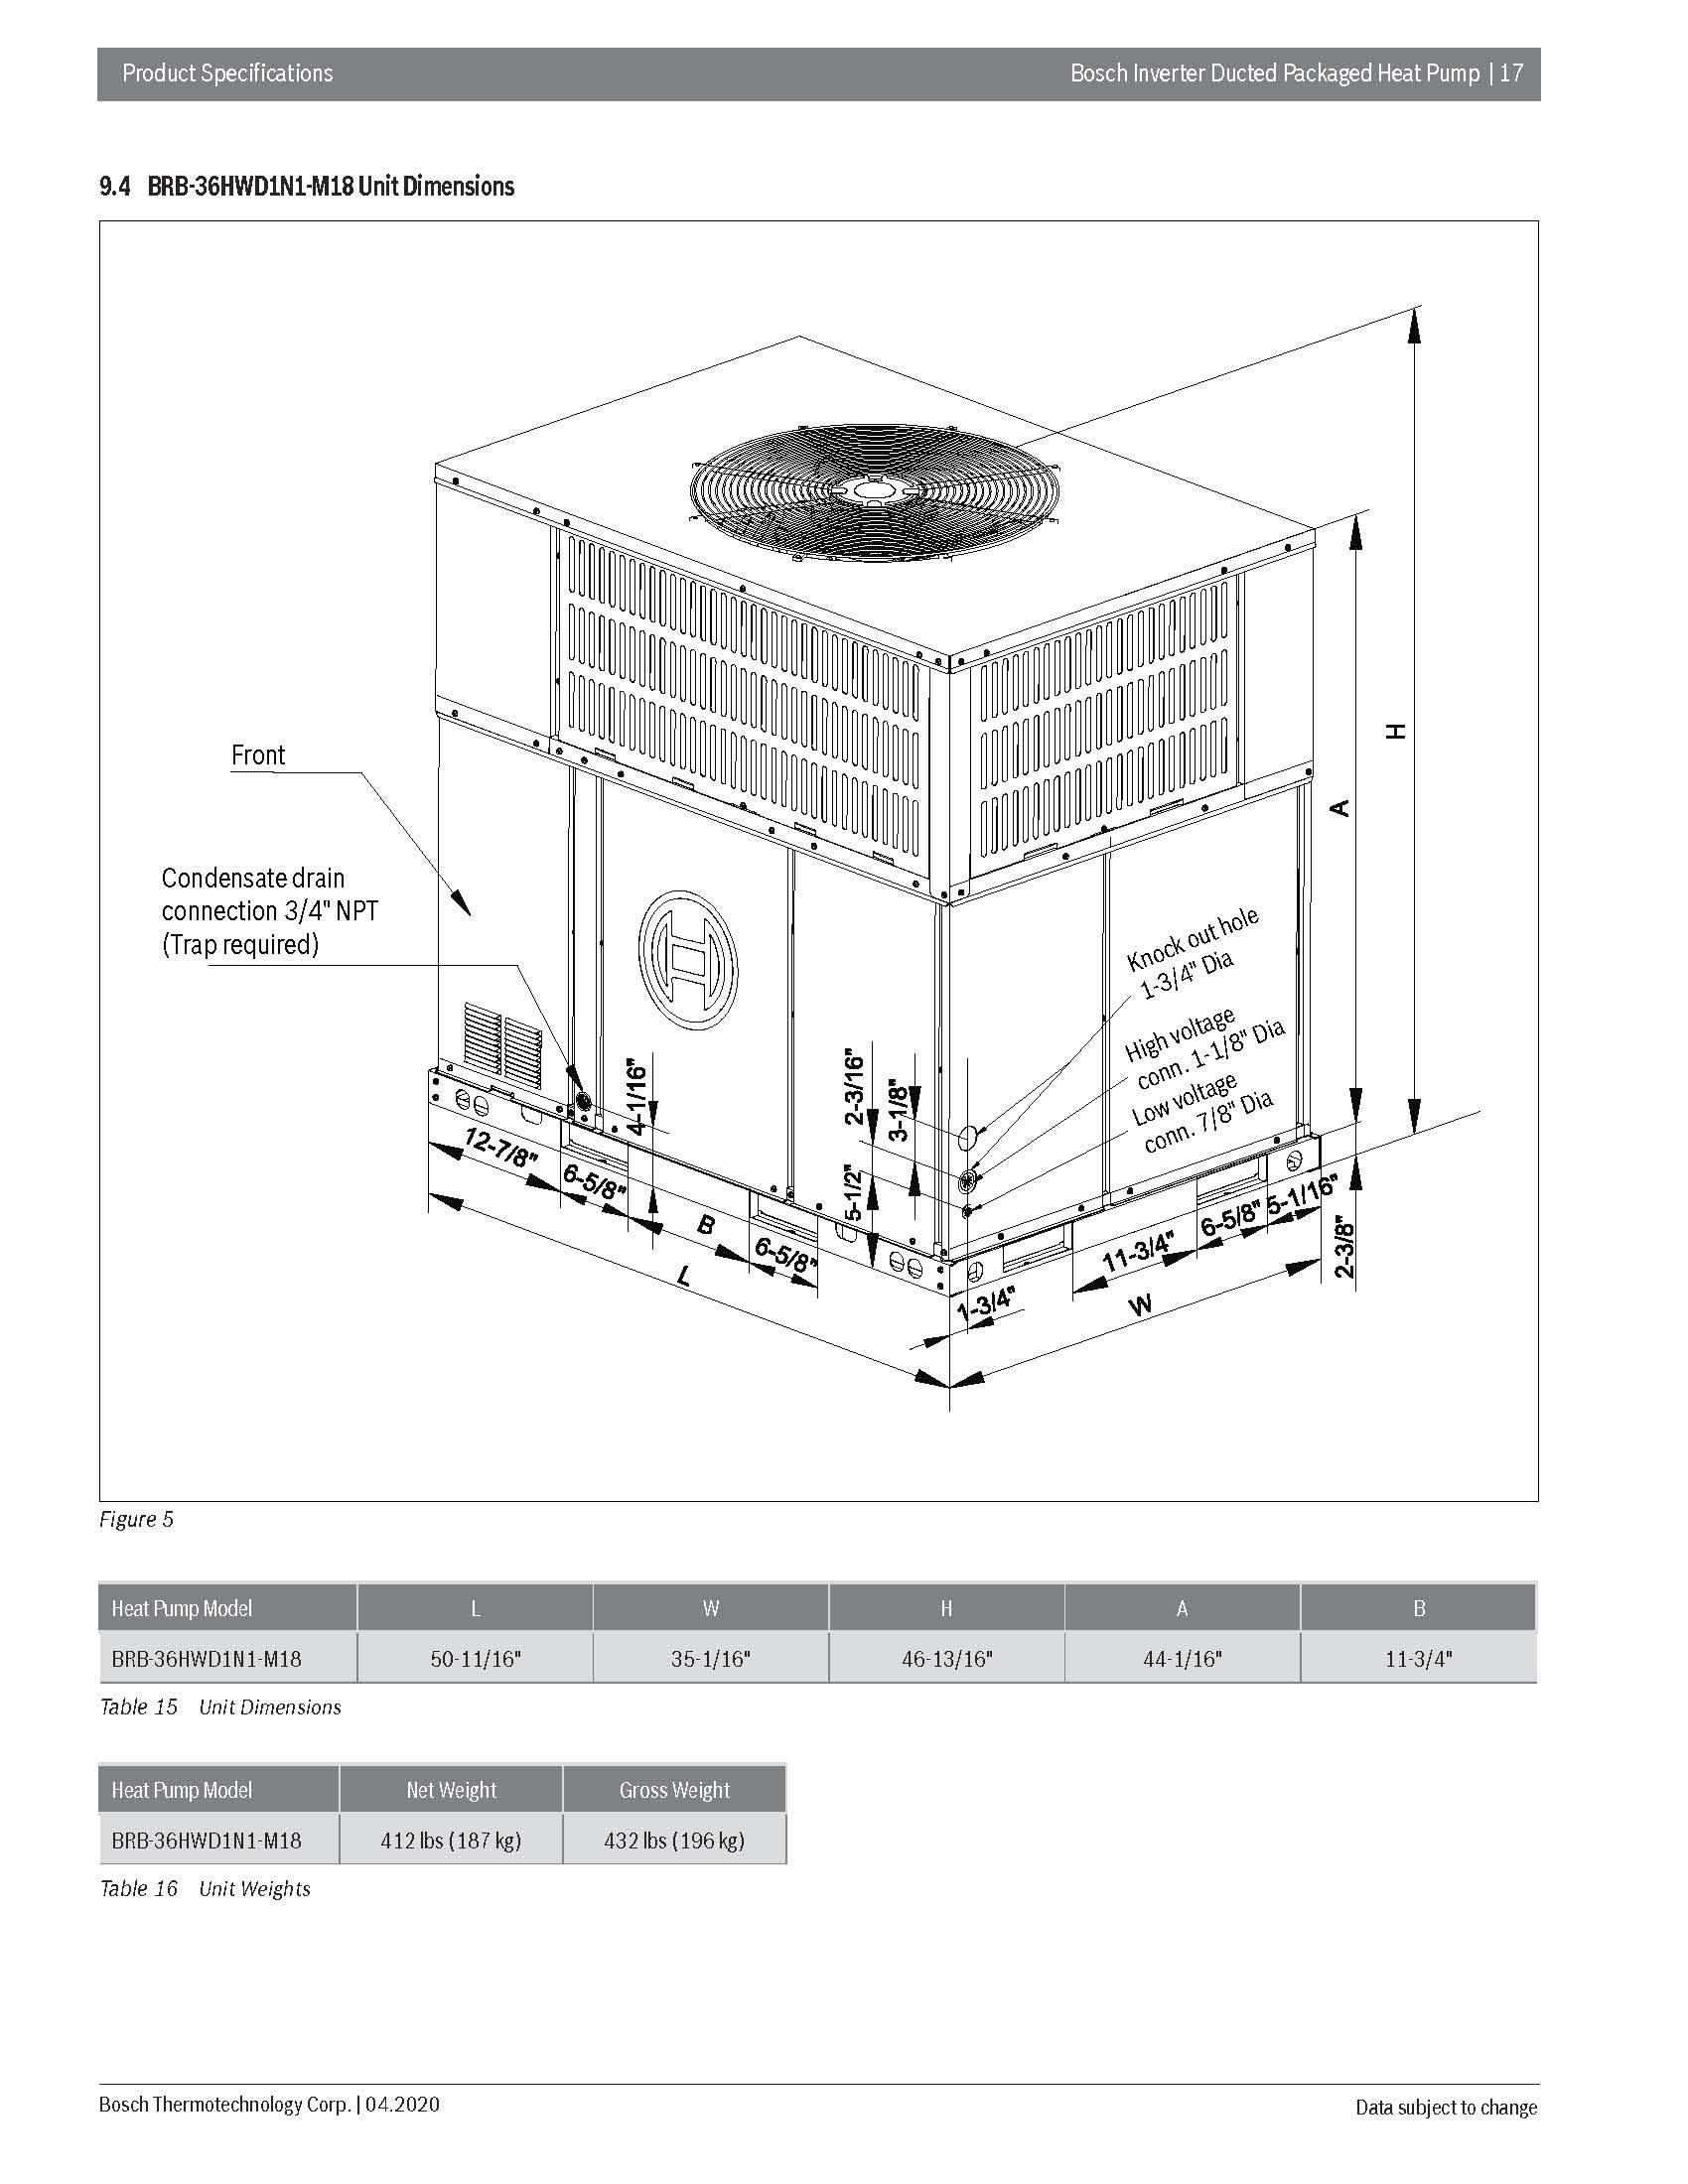 3 Ton Bosch 18.5 SEER Inverter Compressor Heat Pump DOWN